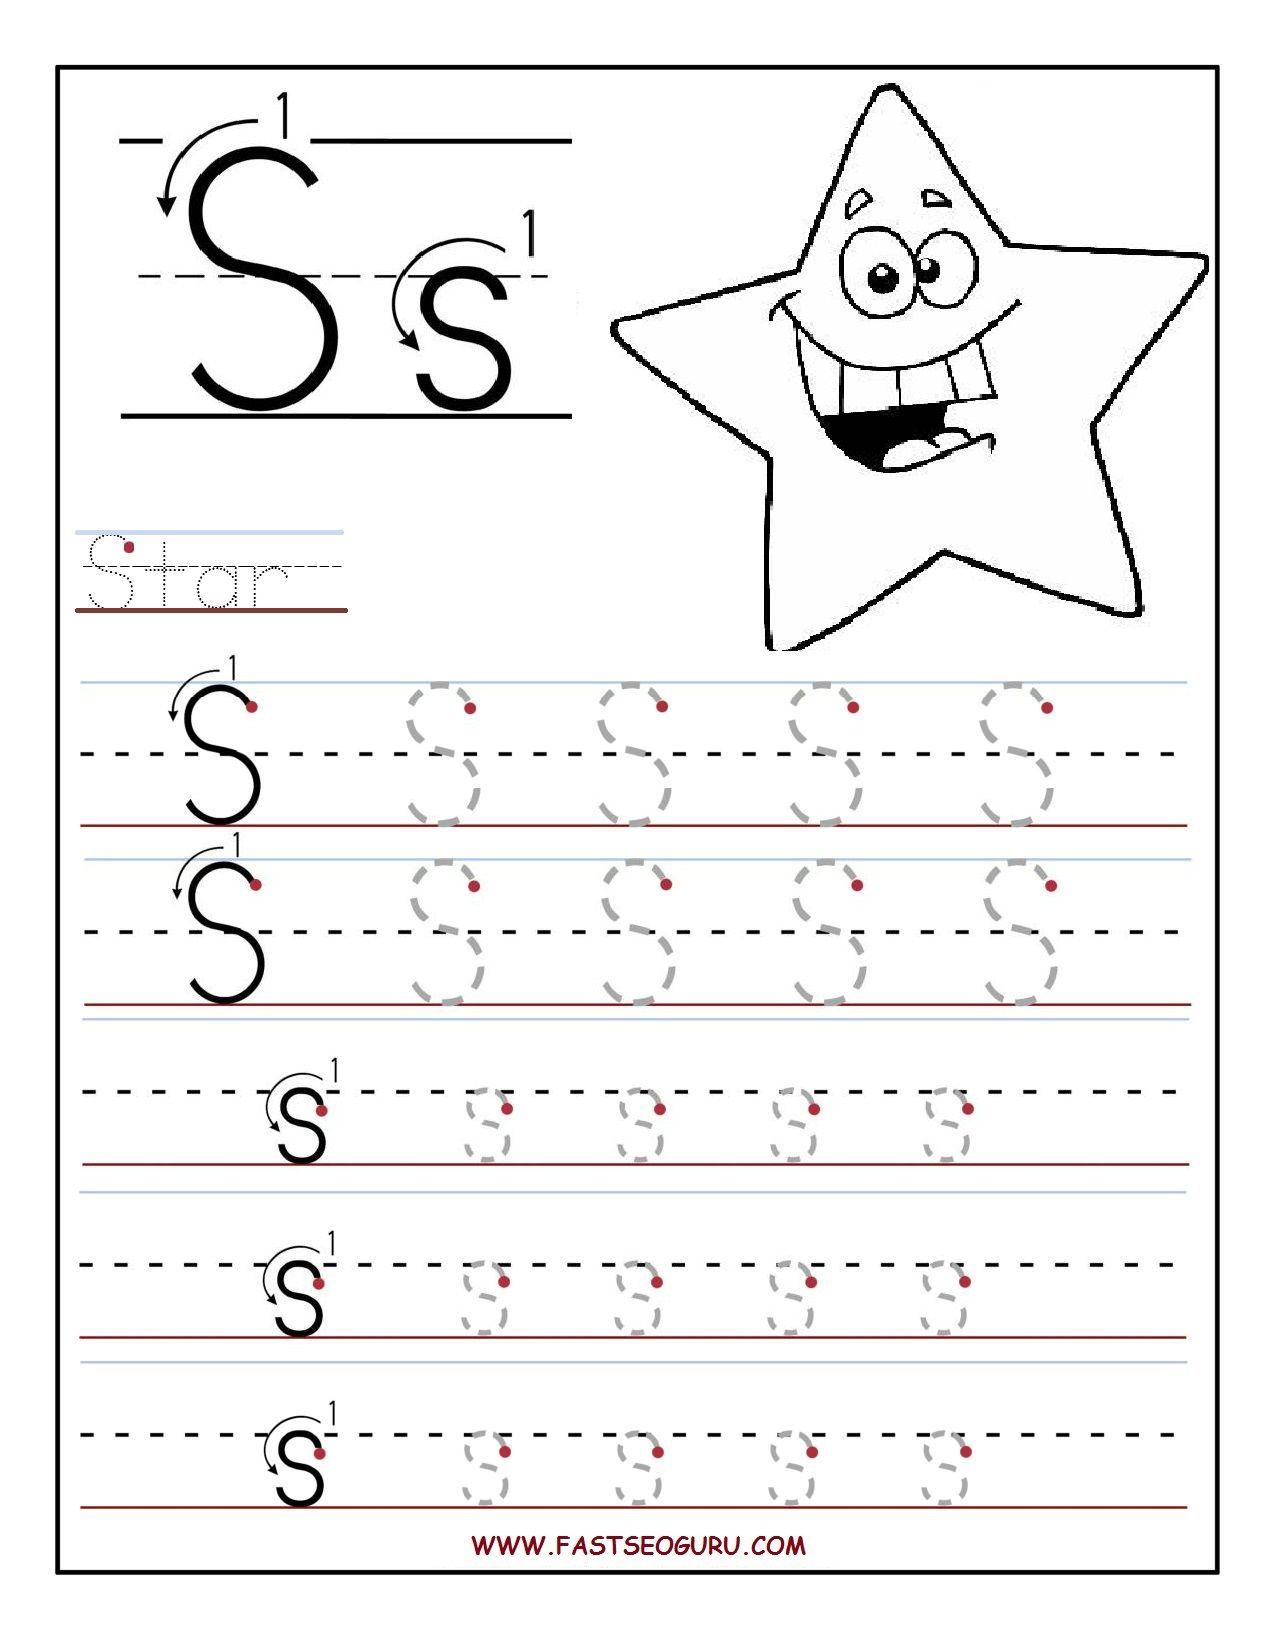 Printable Letter S Tracing Worksheets For Preschool